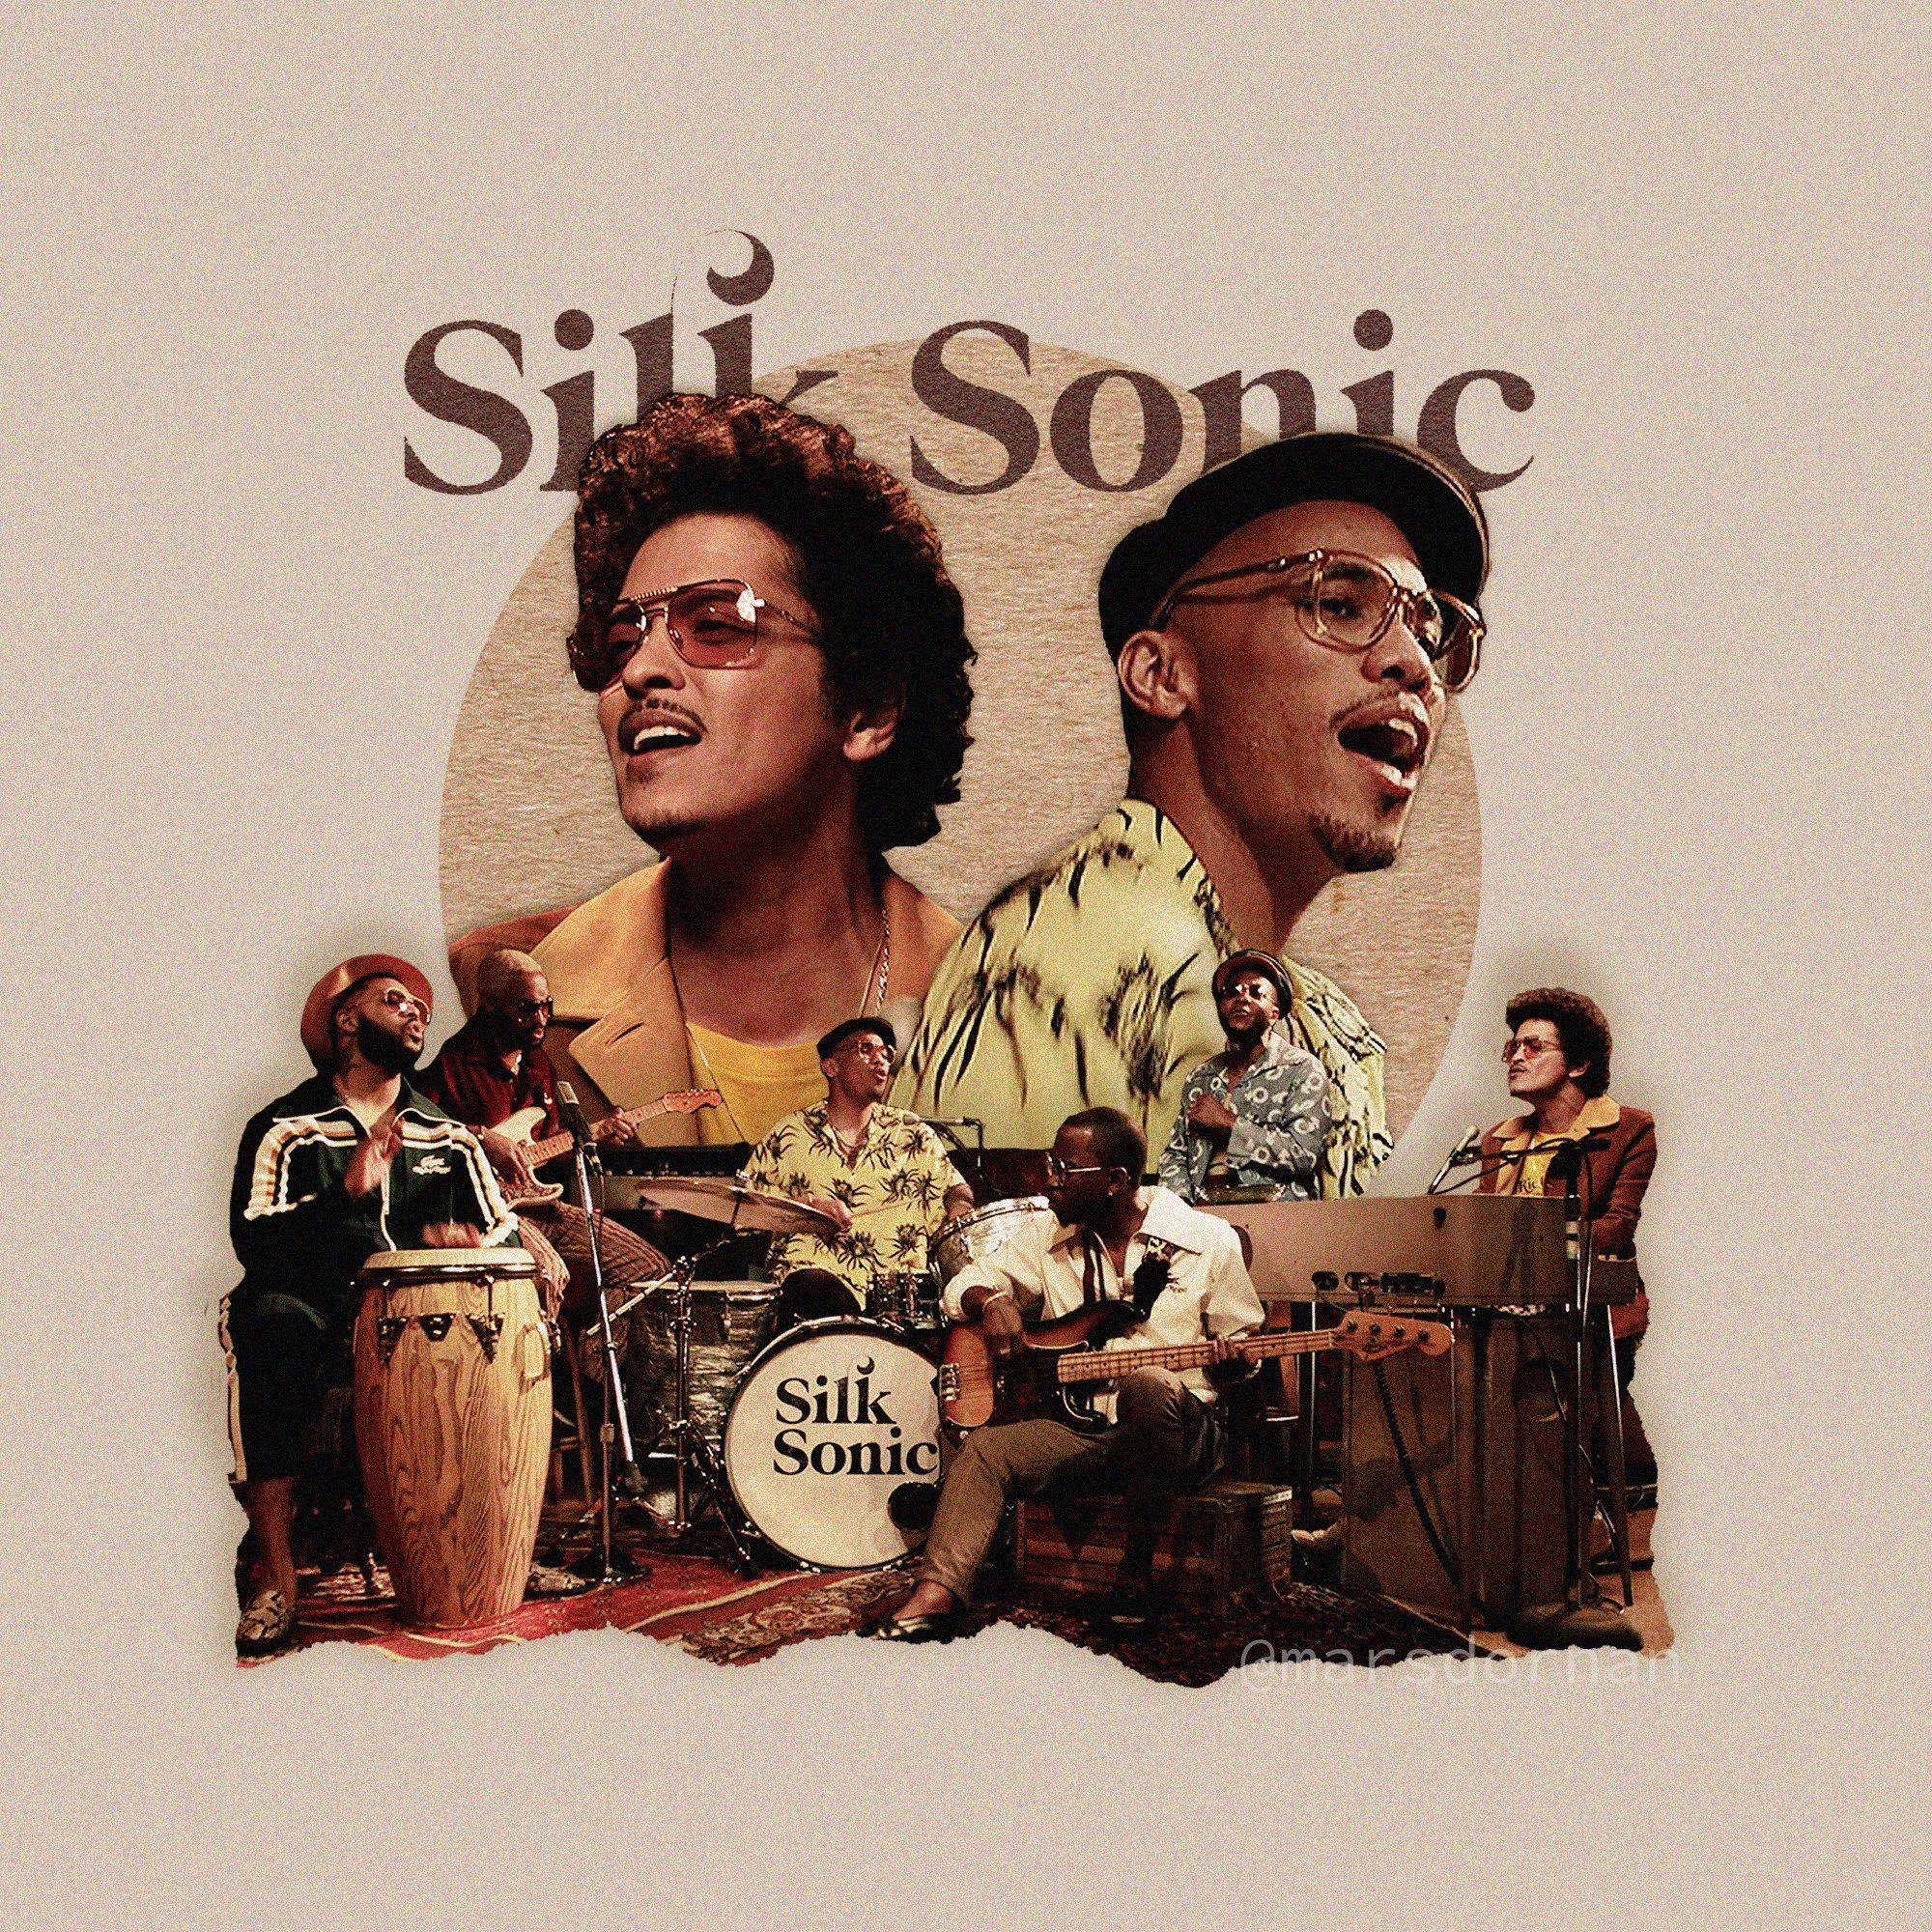 Pin By Jazz Stark On Bruno Mars In 2021 Bruno Mars Vintage Posters Aesthetic Artist